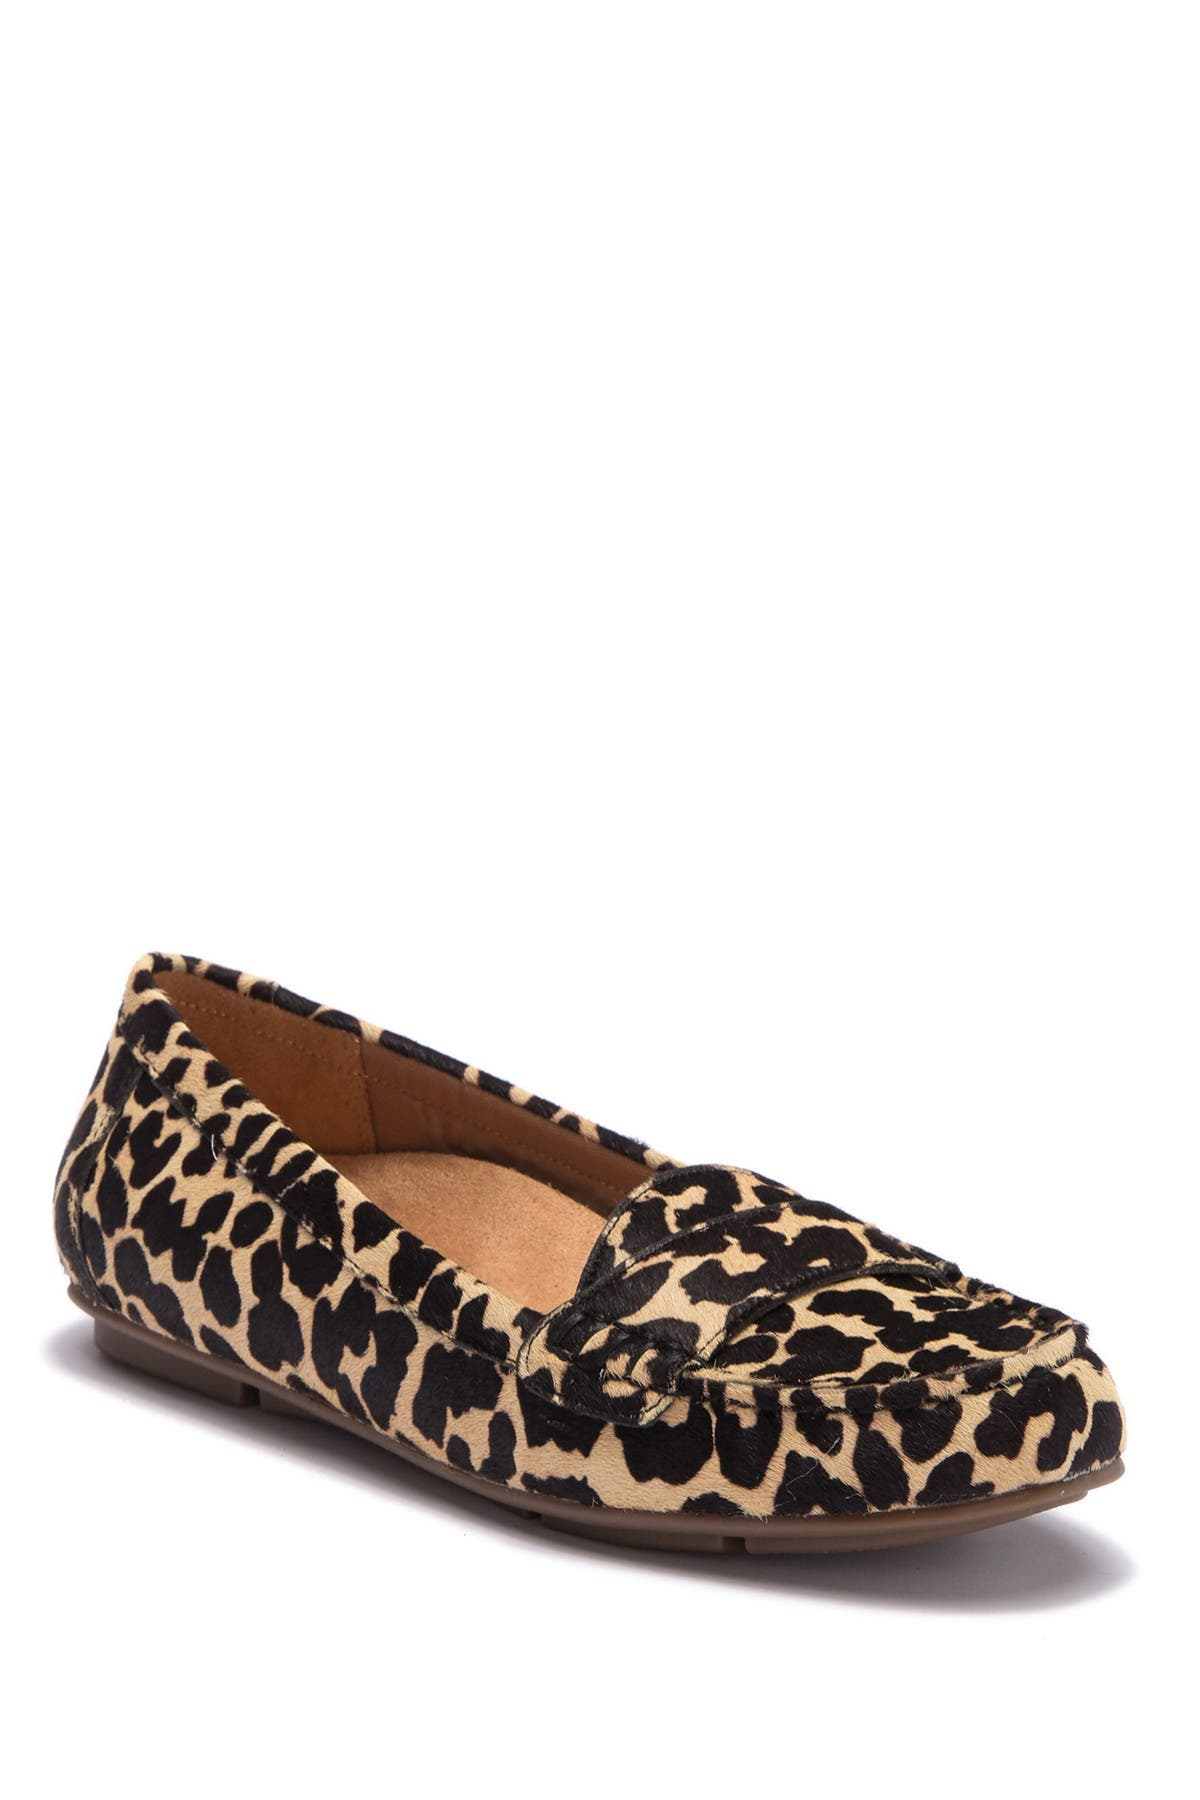 vionic larrun loafer leopard